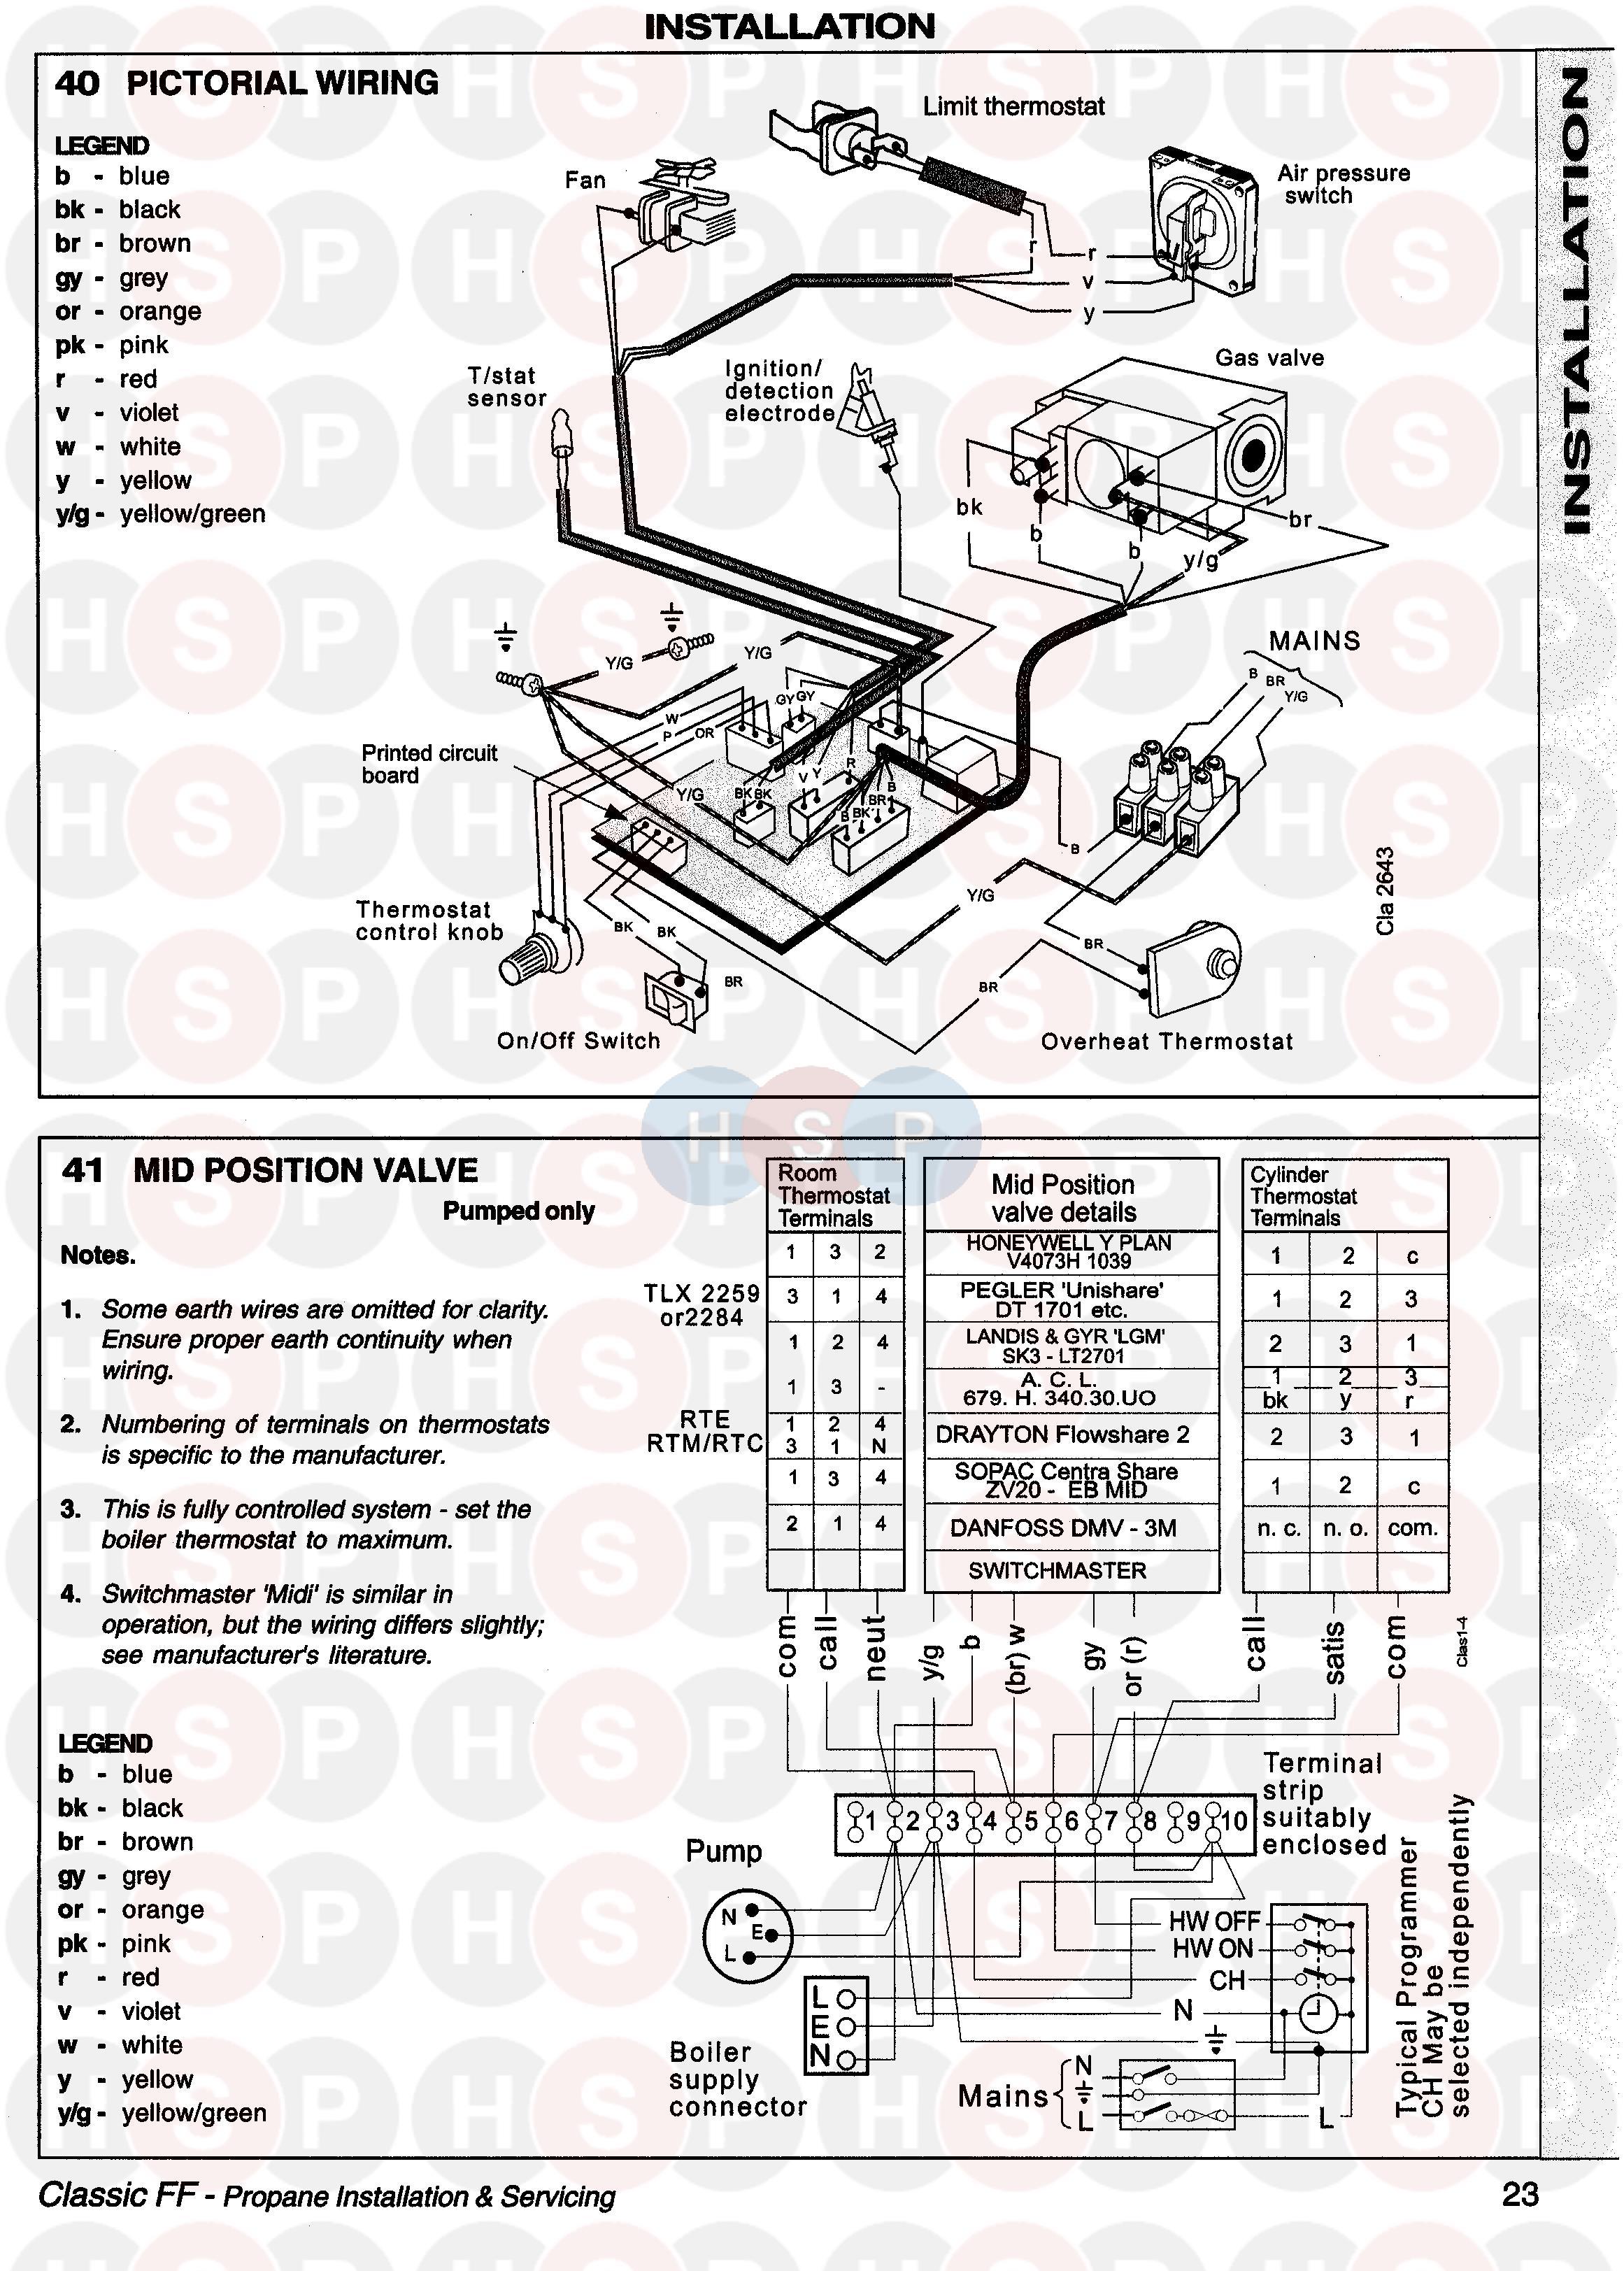 Ideal Classic Ff 380p  Wiring 2 Diagram